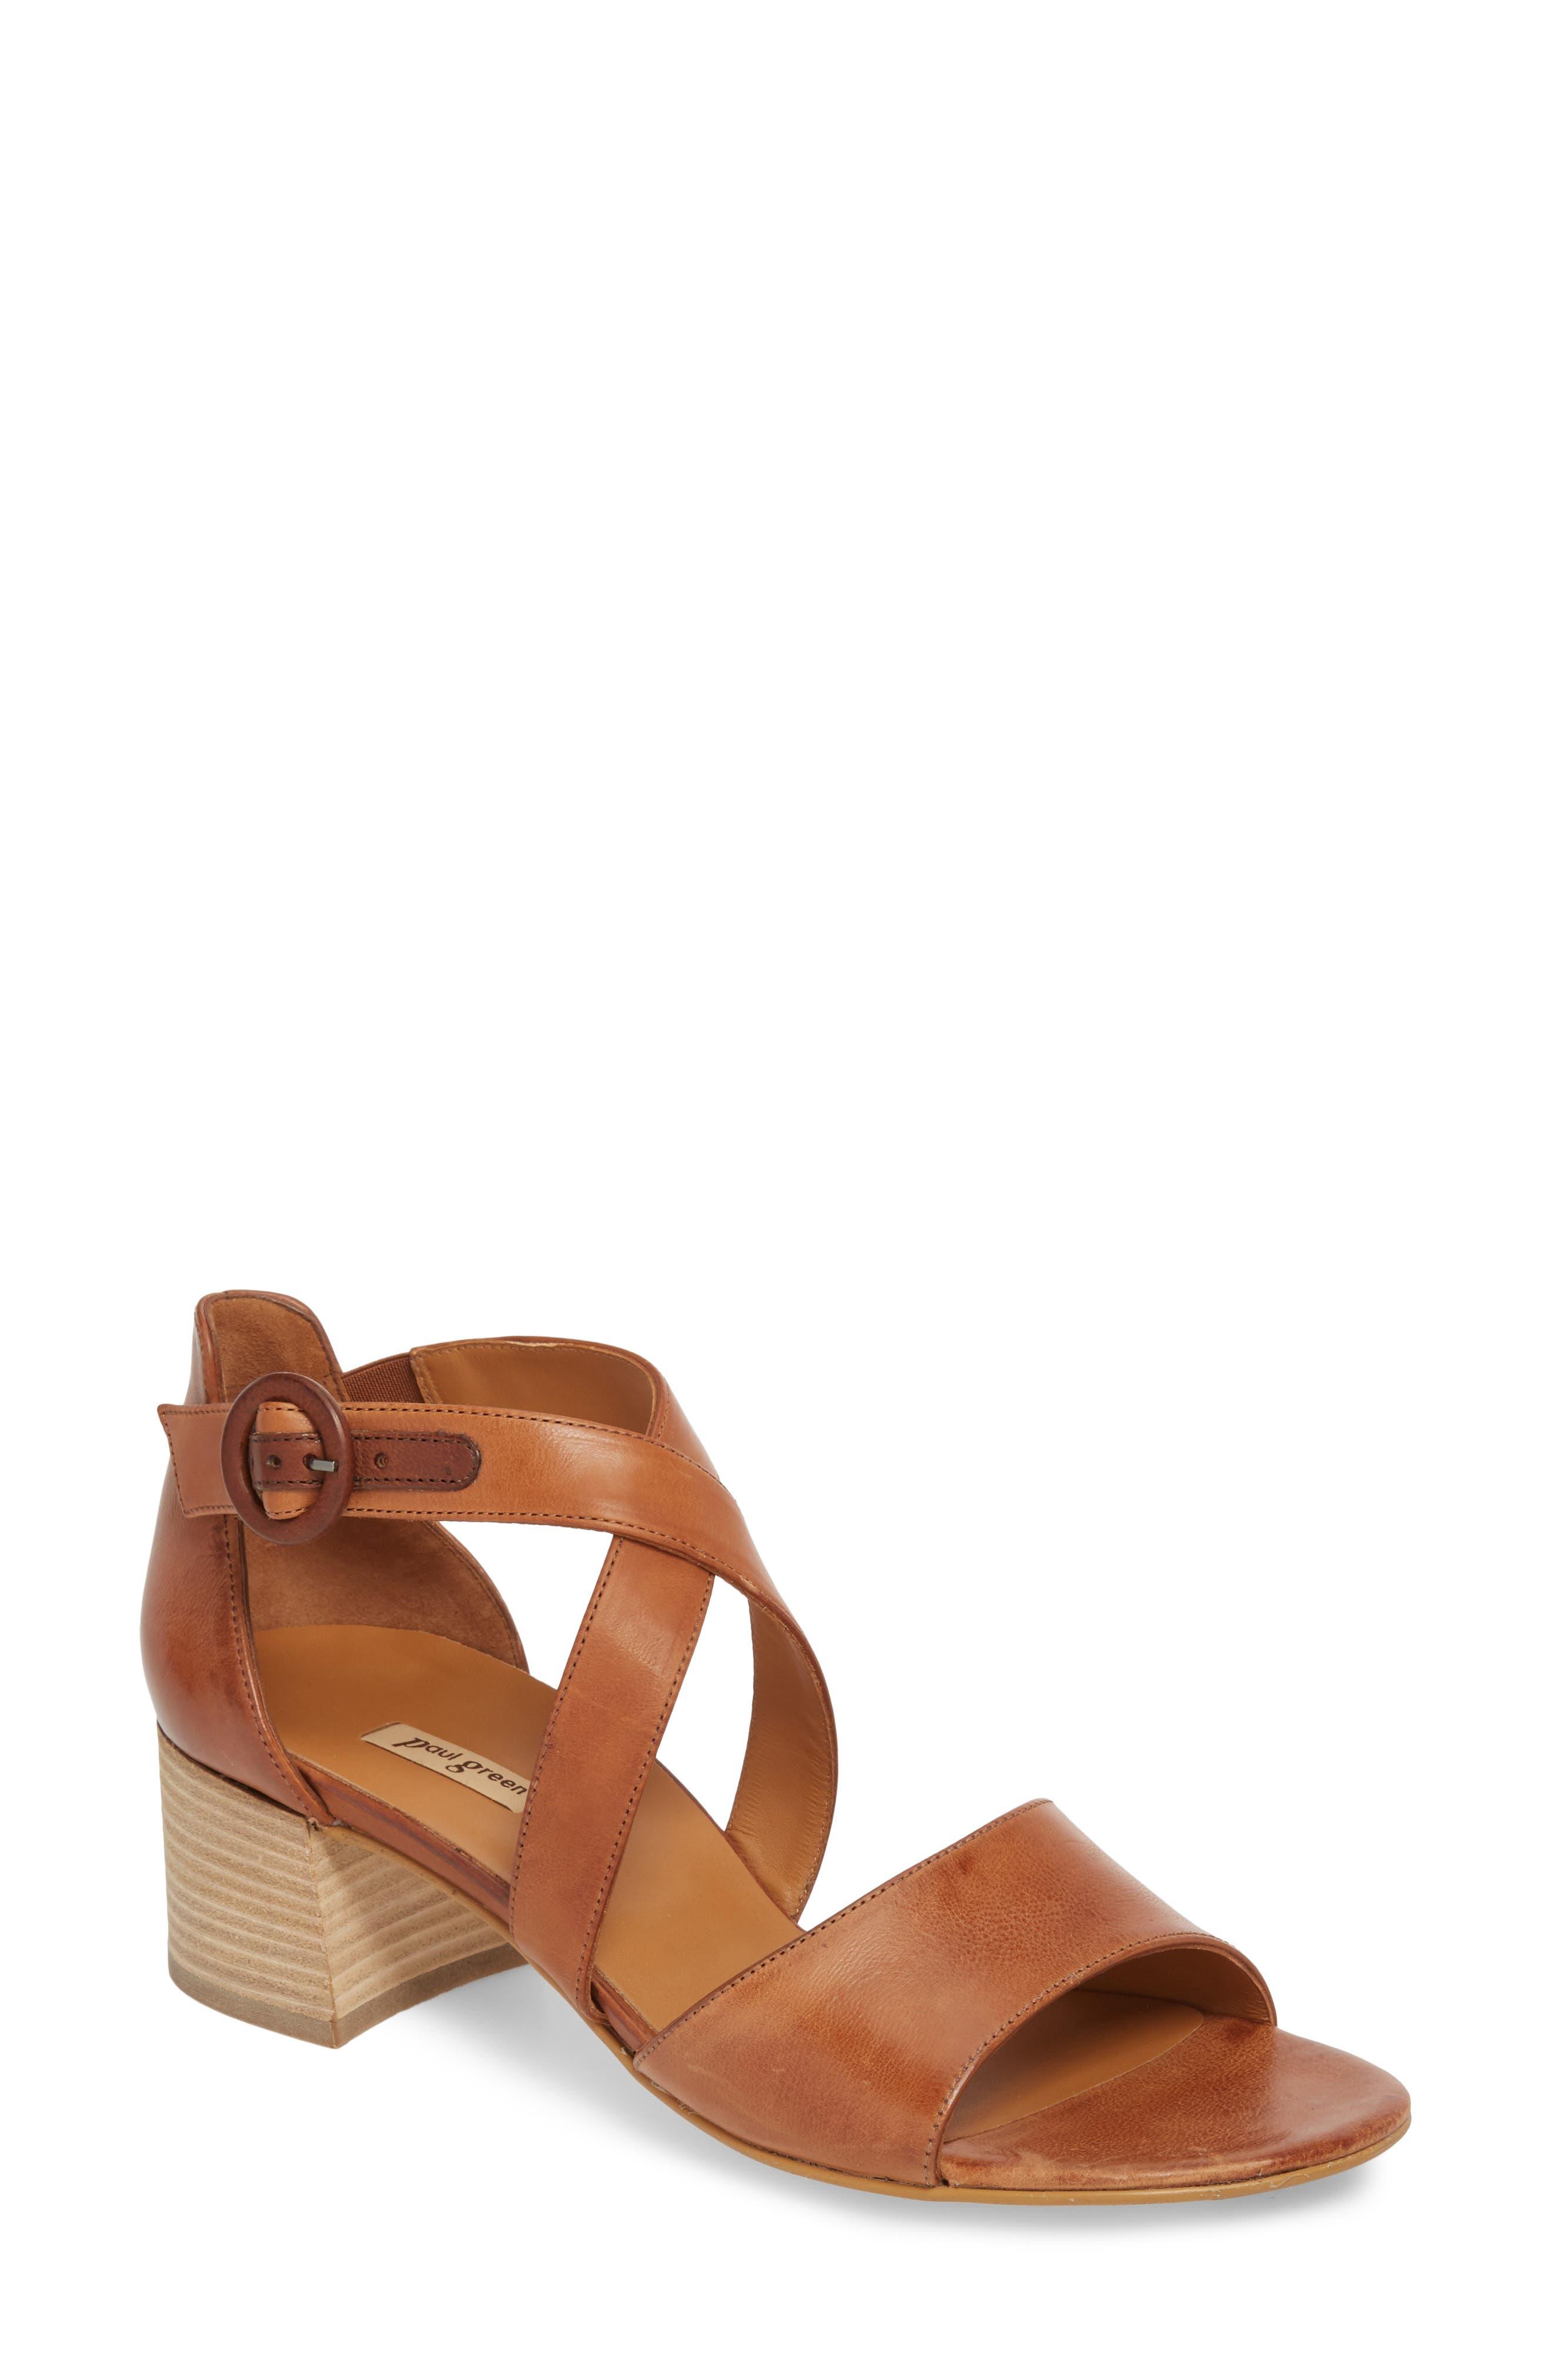 Main Image - Paul Green Sally Quarter Strap Sandal (Women)